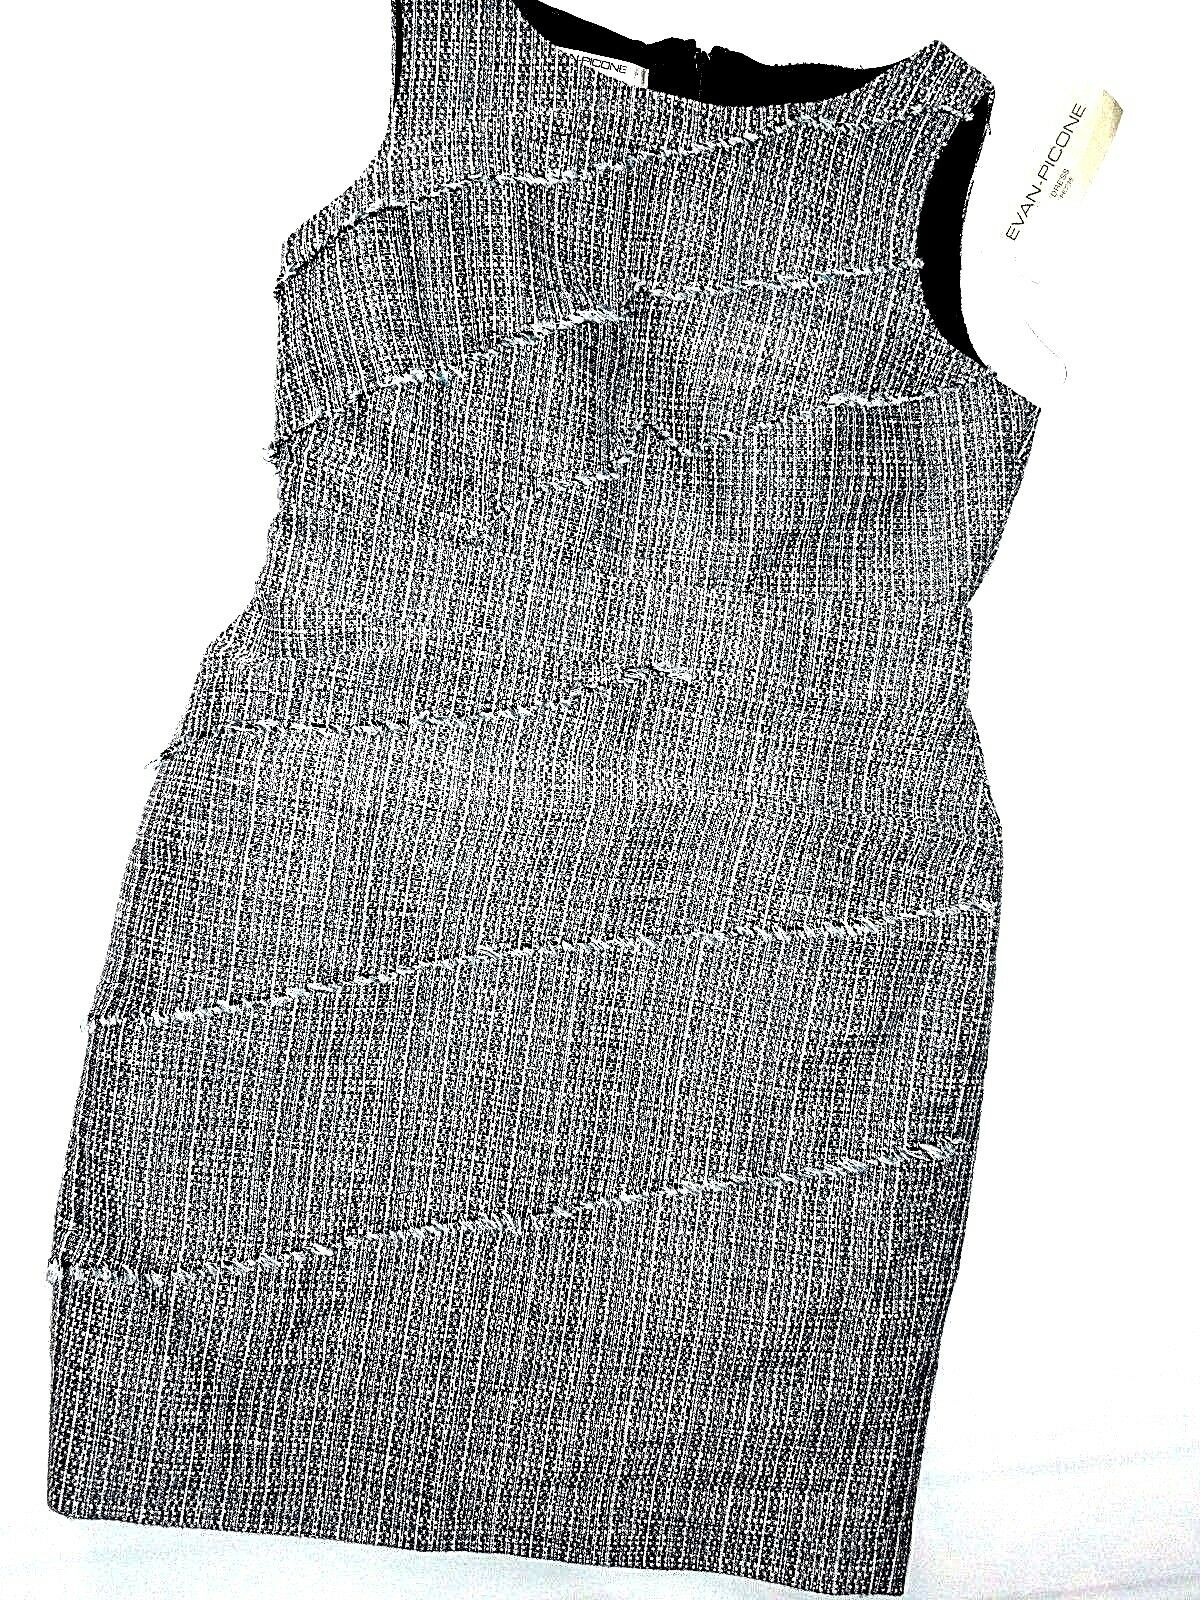 EVAN Picone A line blueeberry bluee tweed  A line Dress size 8P 8 Petite